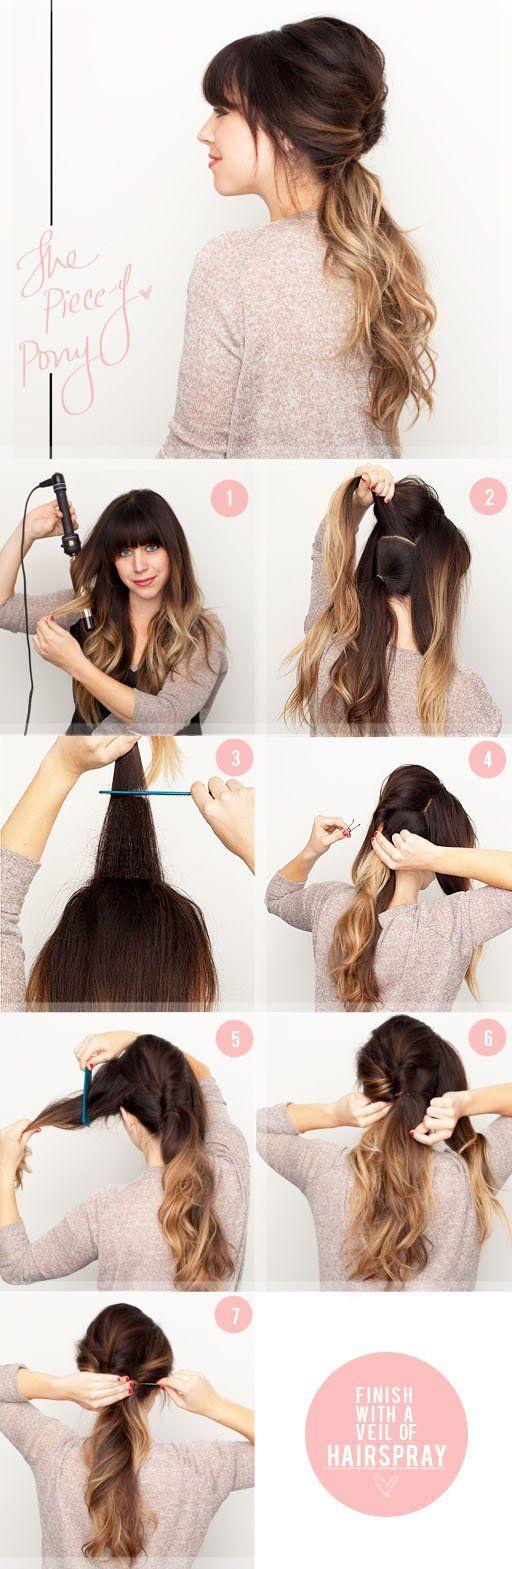 Tbdthepieceypony hair for nursing pinterest twist ponytail